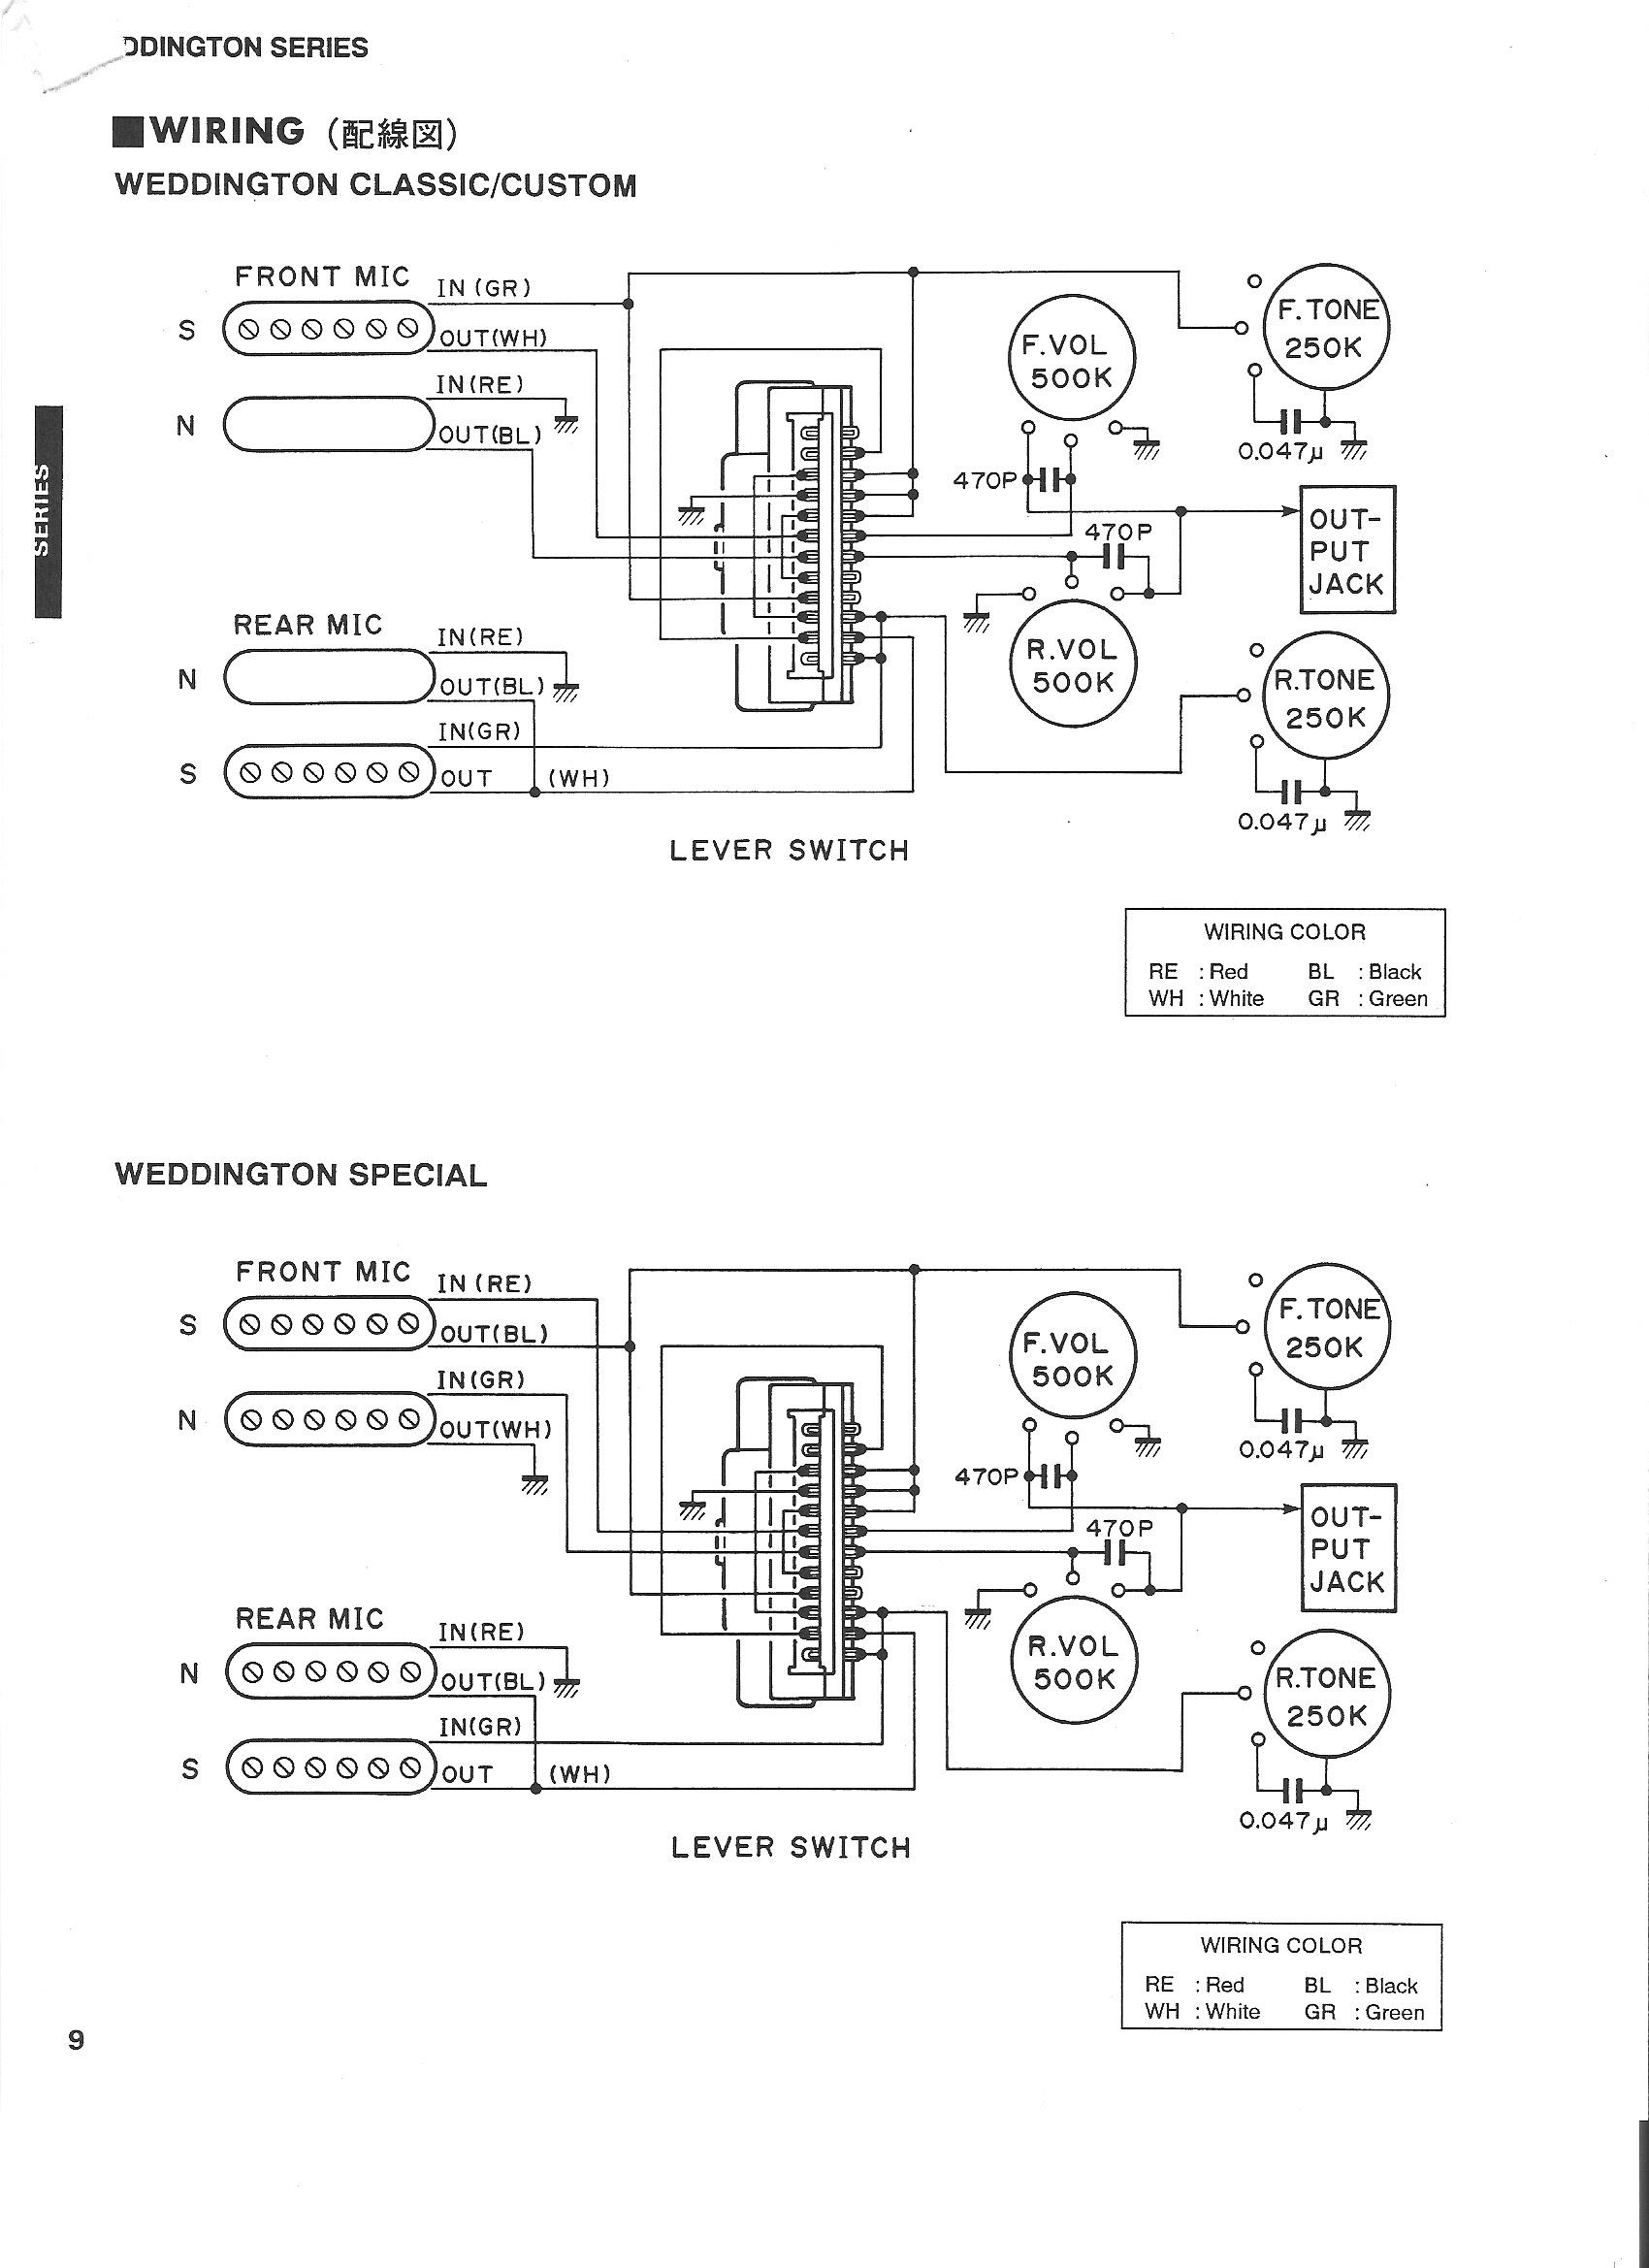 mosrite guitar wiring diagram photo s of mosrite wiring sc rh color castles com Single Pickup Guitar Wiring Diagram Jackson Guitar Wiring Diagrams